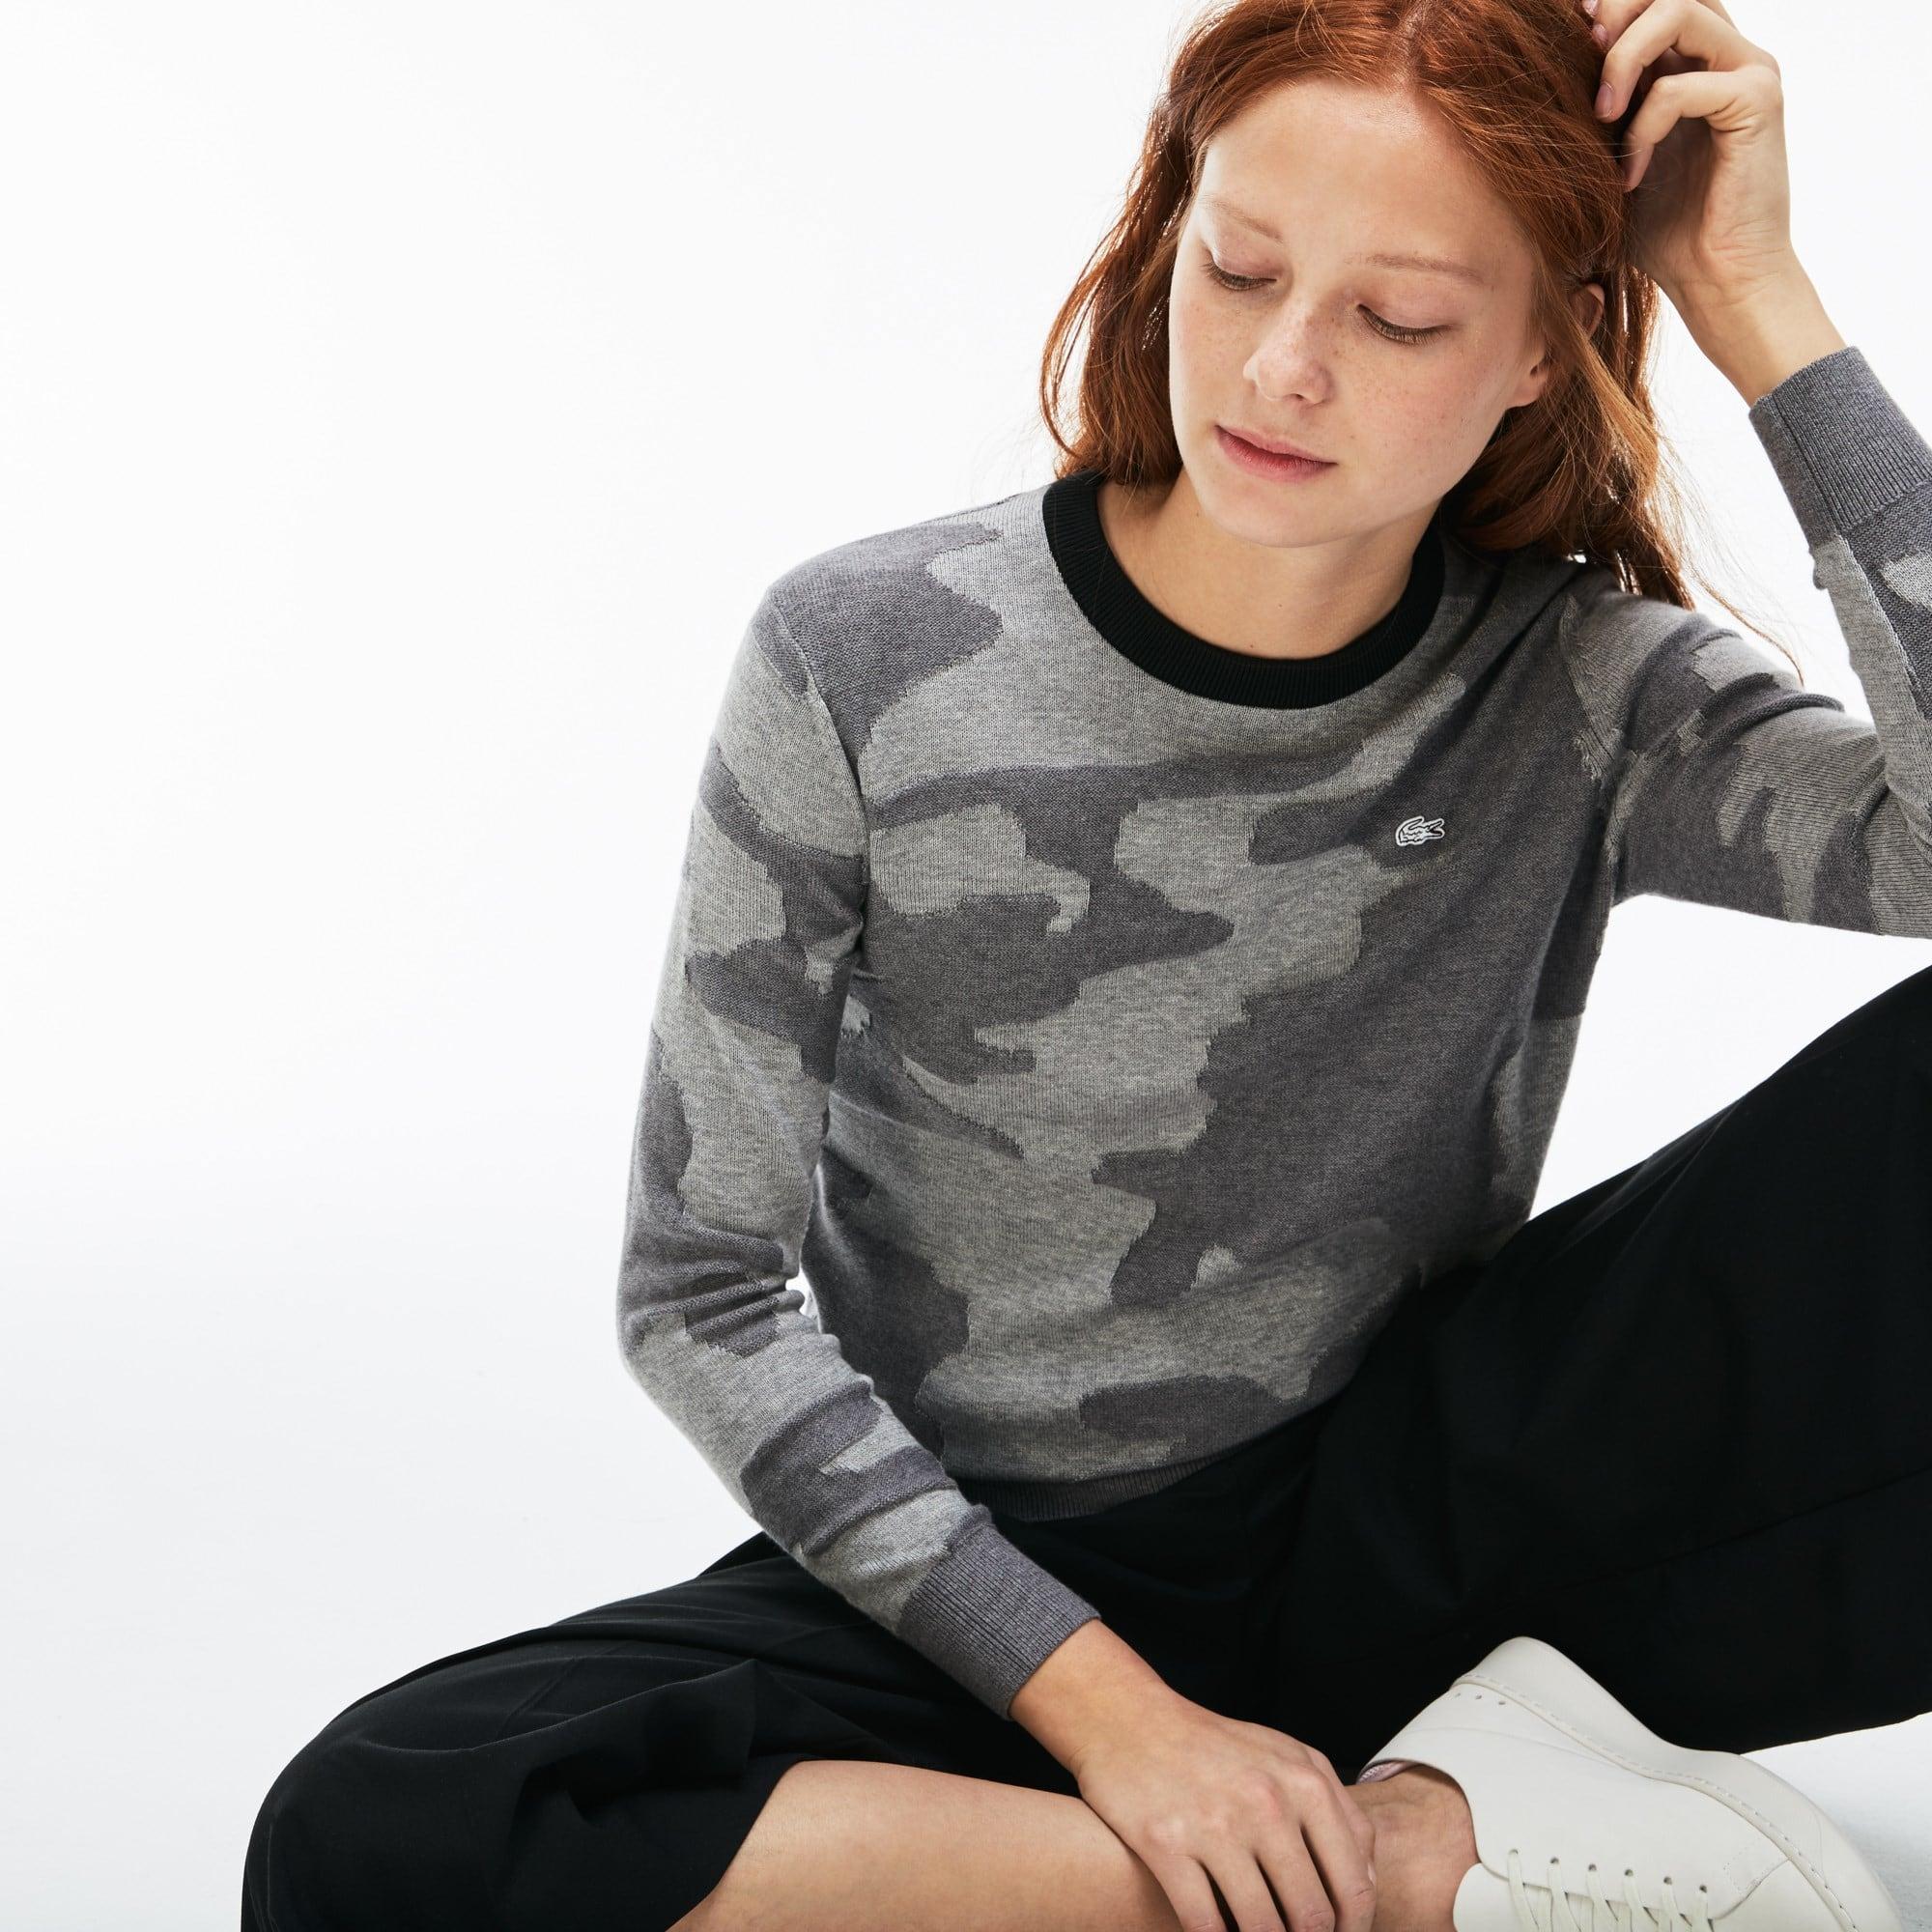 Women's Lacoste LIVE Crew Neck Camouflage Print Jacquard Sweater